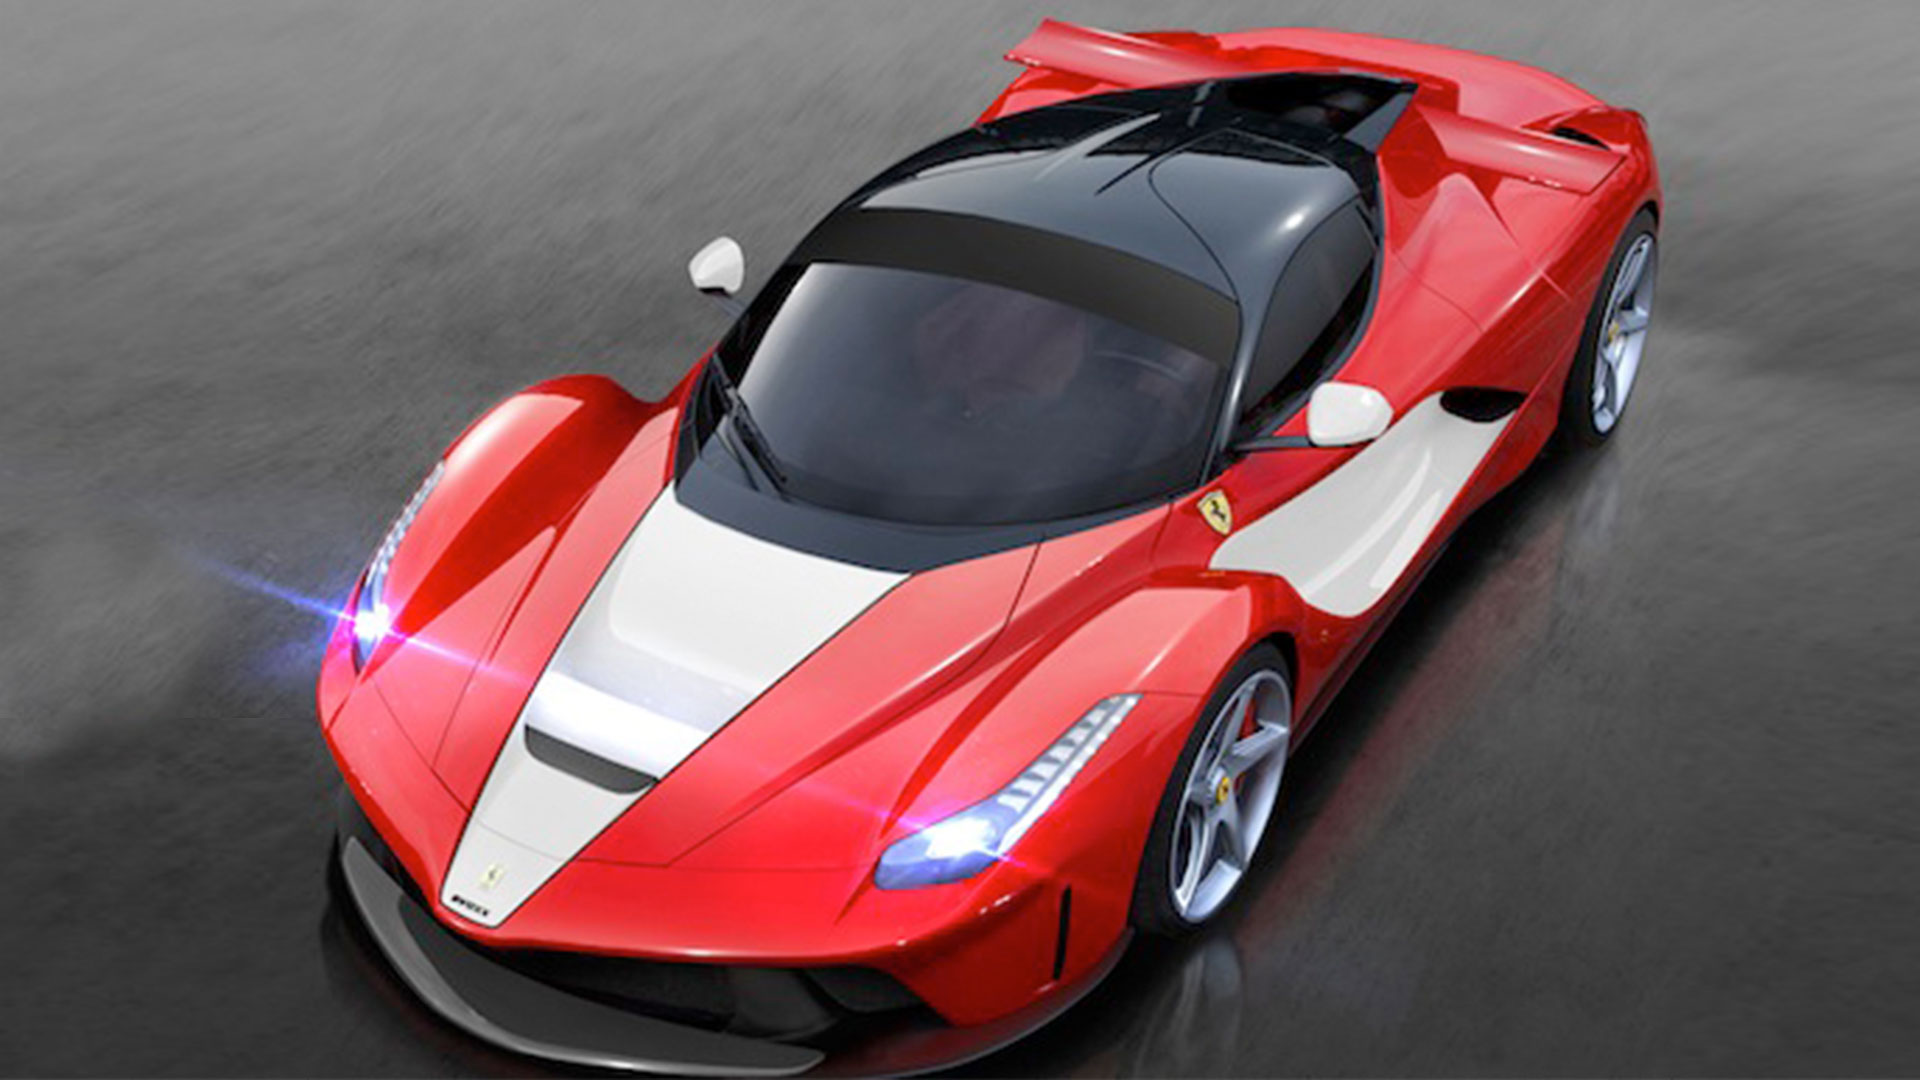 Ferrari laferrari wallpapers high quality download free vanachro Choice Image